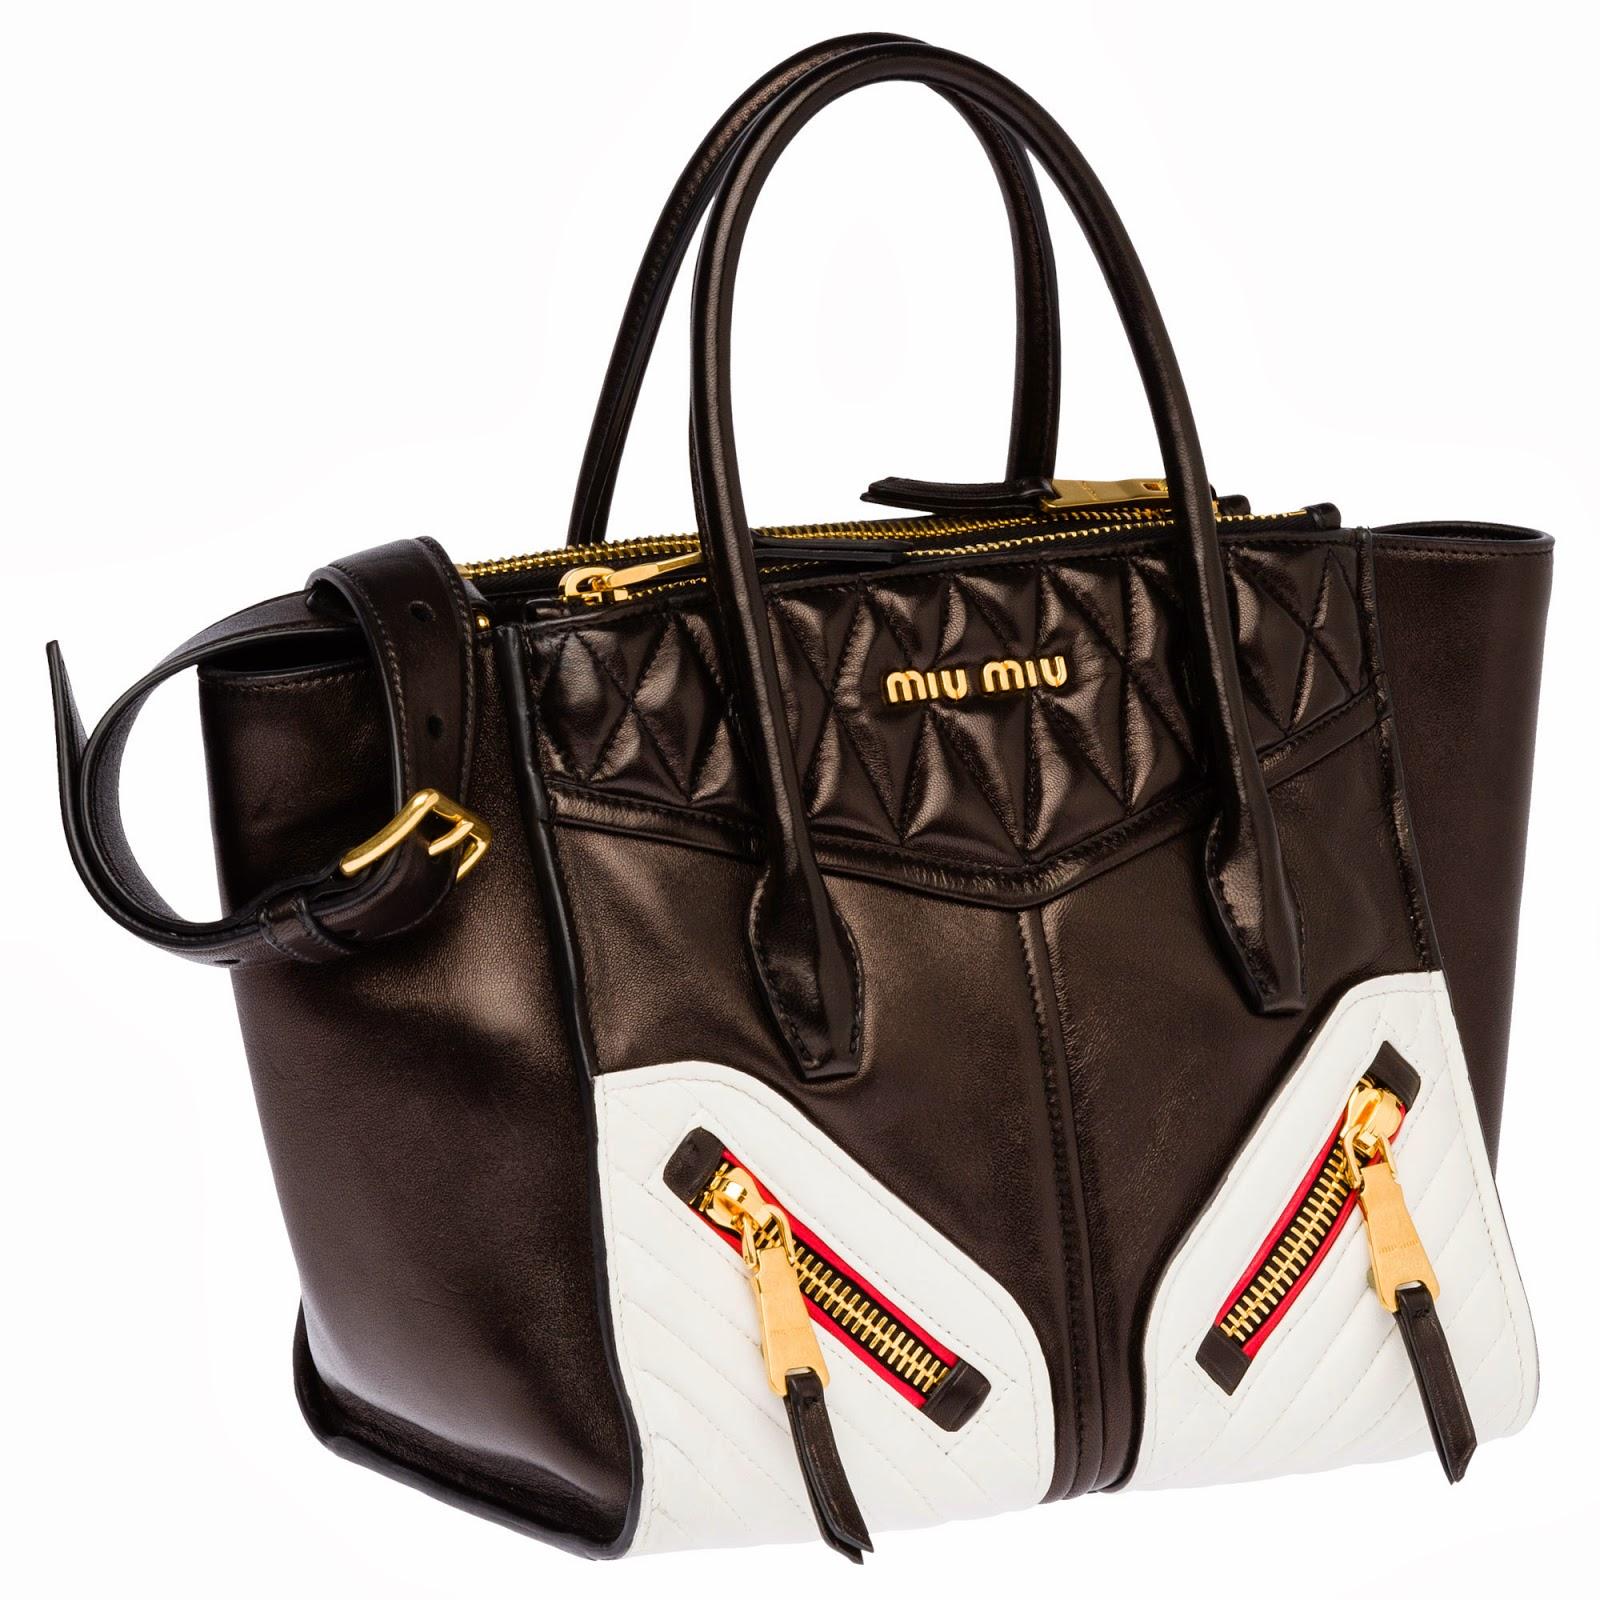 2014+%25C3%25A7antalar Miu Miu Herbst Winter 2014 Handtaschen Modelle